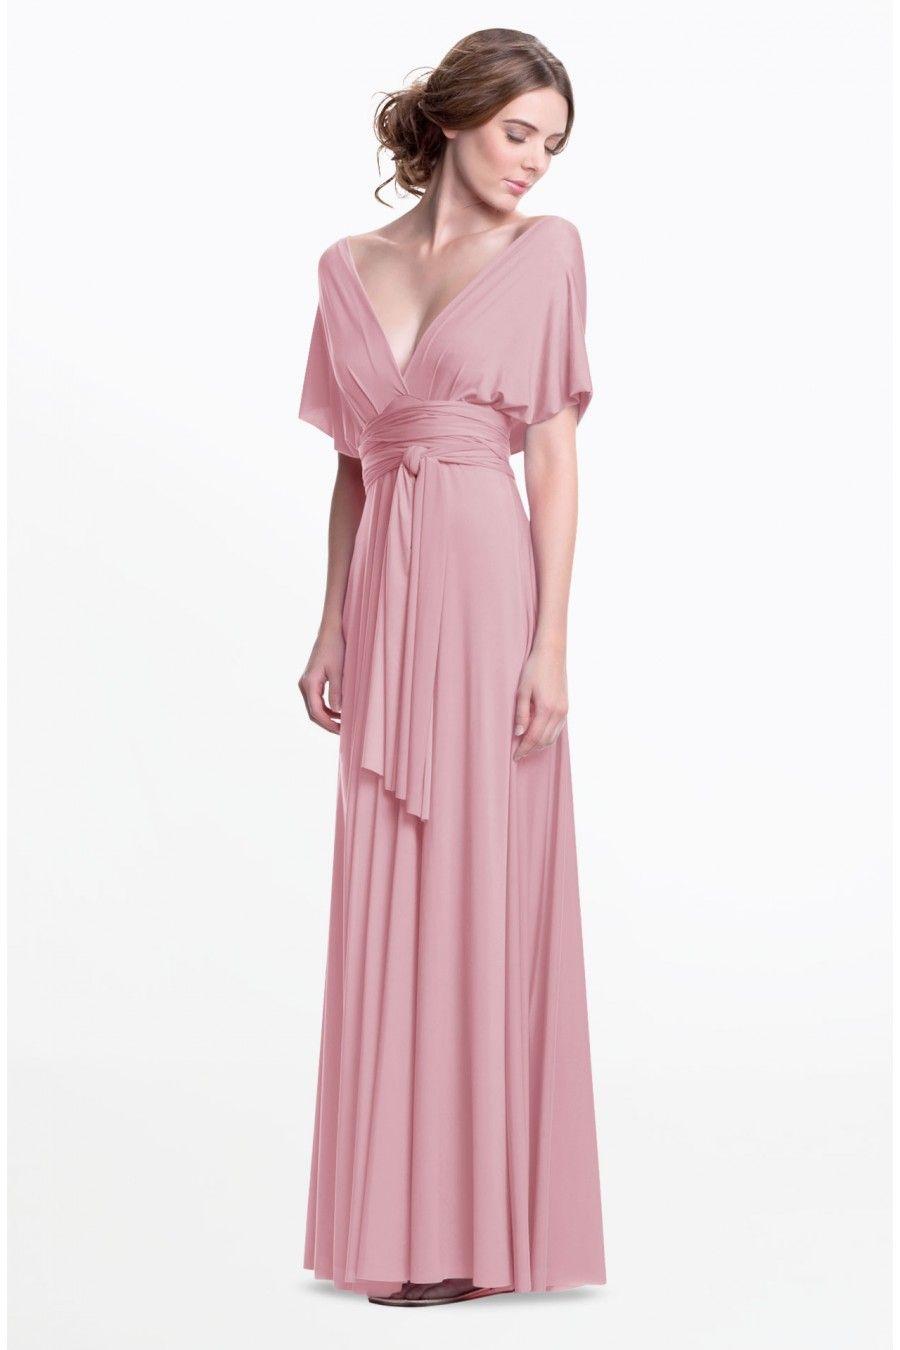 Sakura Maxi Convertible Dress - Made to Order | Wedding inspiration ...